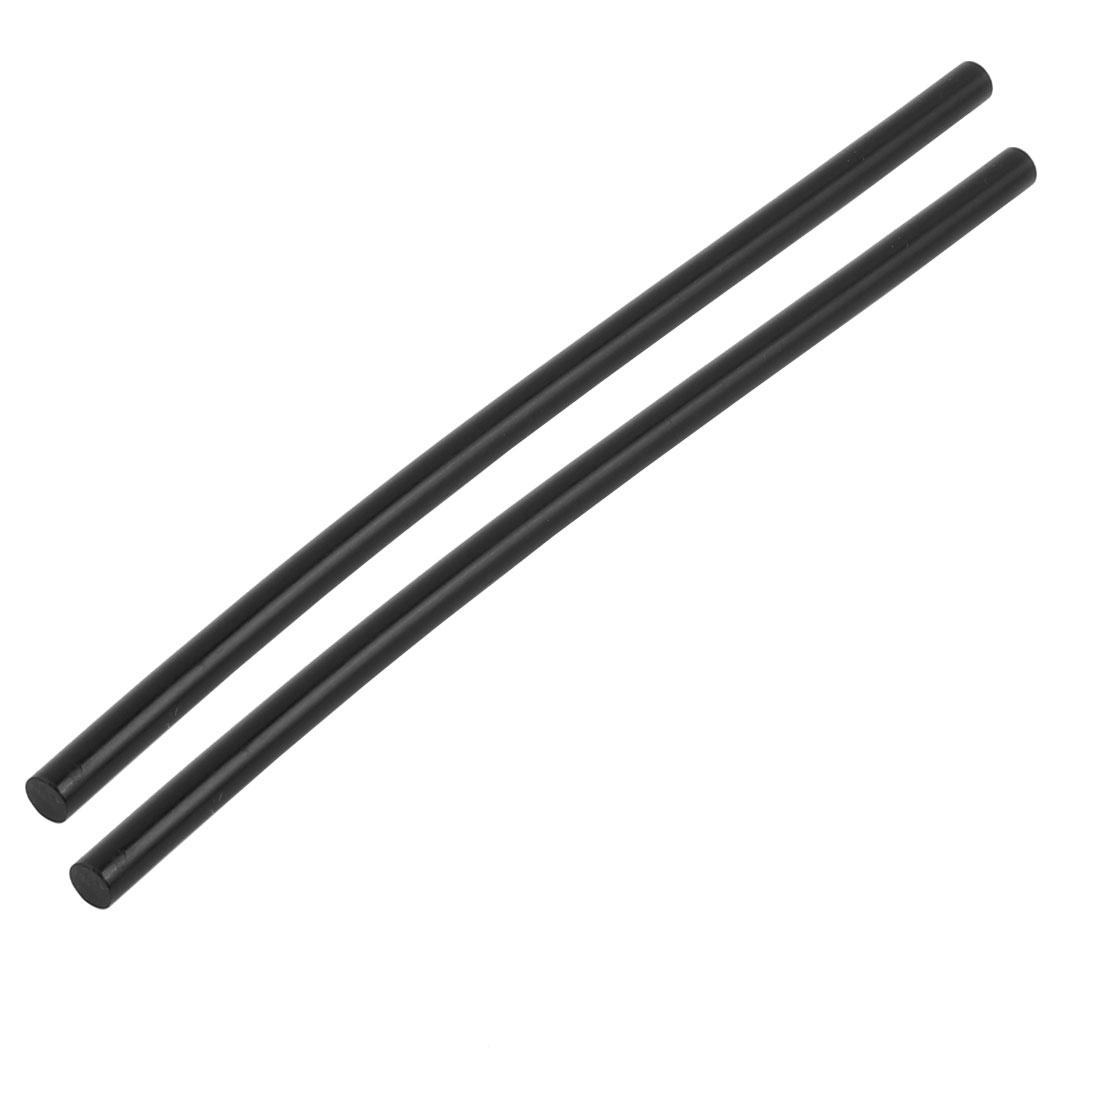 2pcs 7mm x 210mm Black Hot Melt Glue Stick for Electric Tool Hot Melt Glue Gun